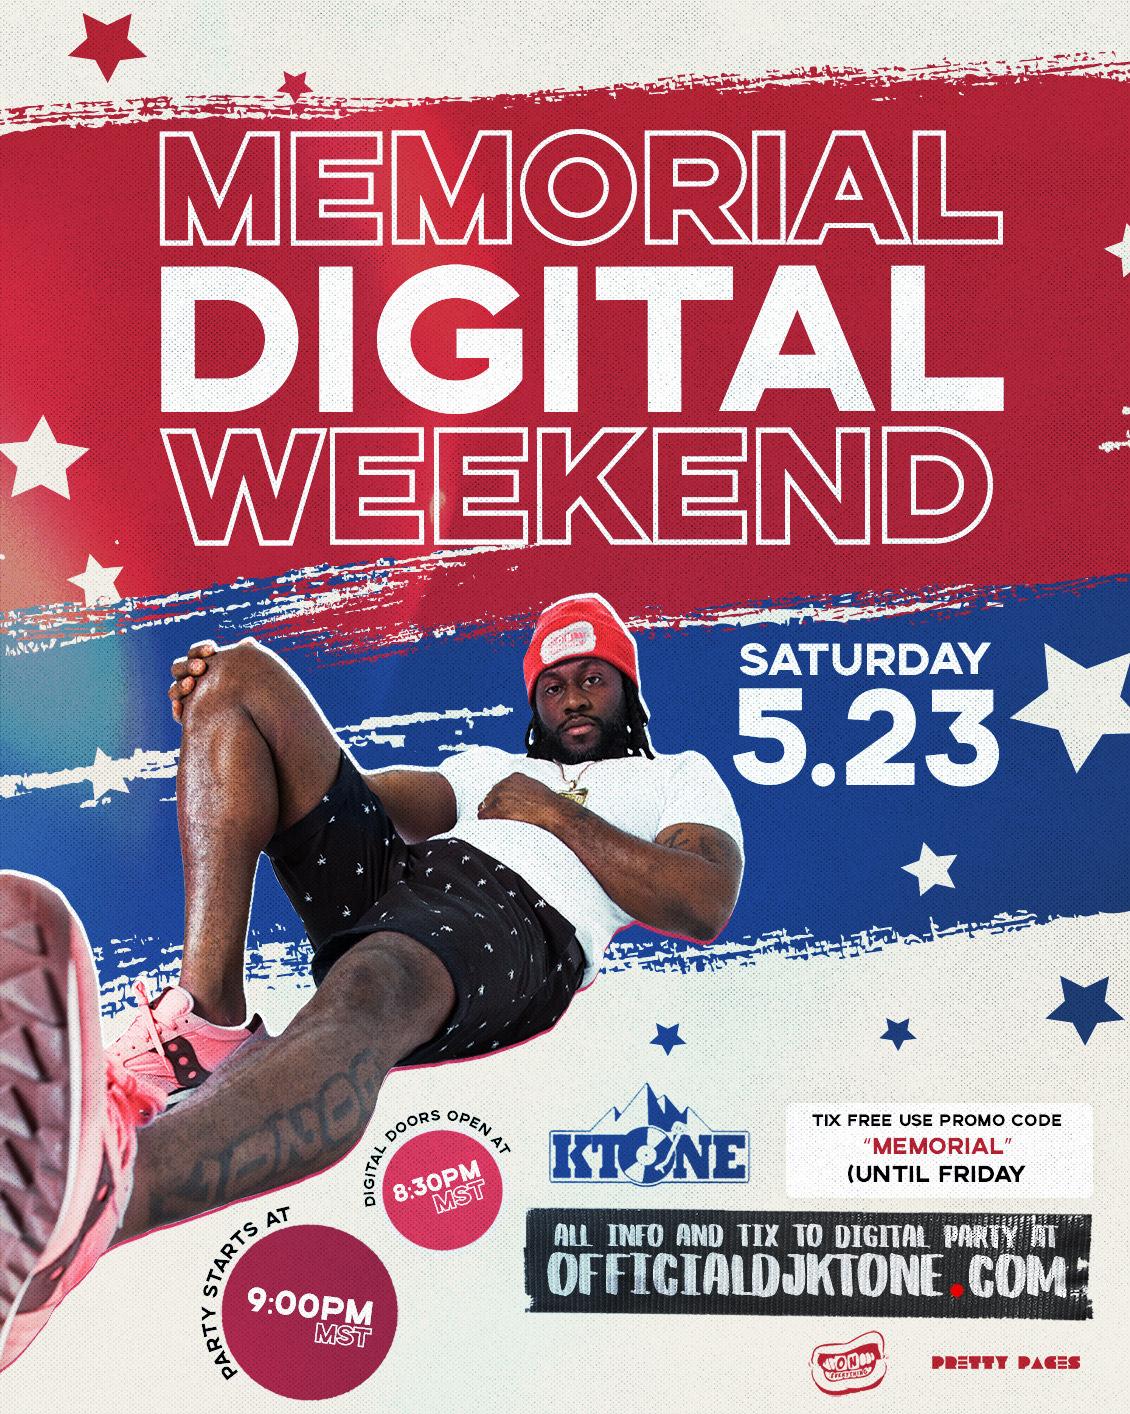 DJ Ktone presents Saturday Night Live Memorial Digital Weekend 2020